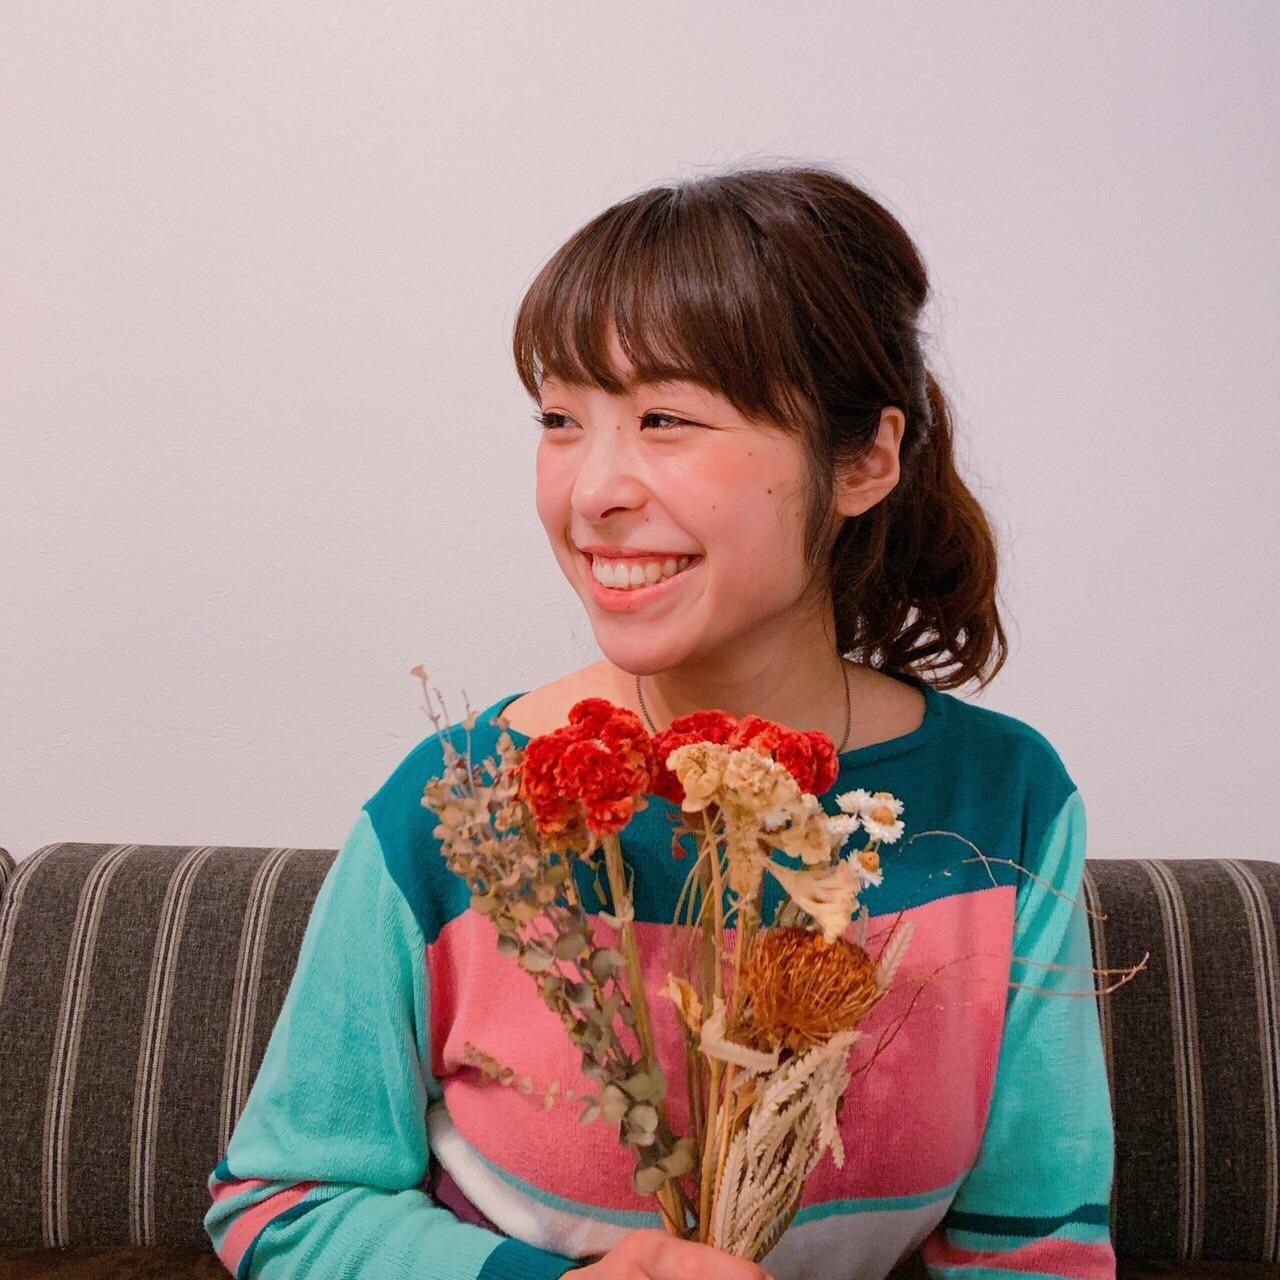 (JP) アーティストとして生きるーうみがめ舎ファミリー紹介vol.1めばえー